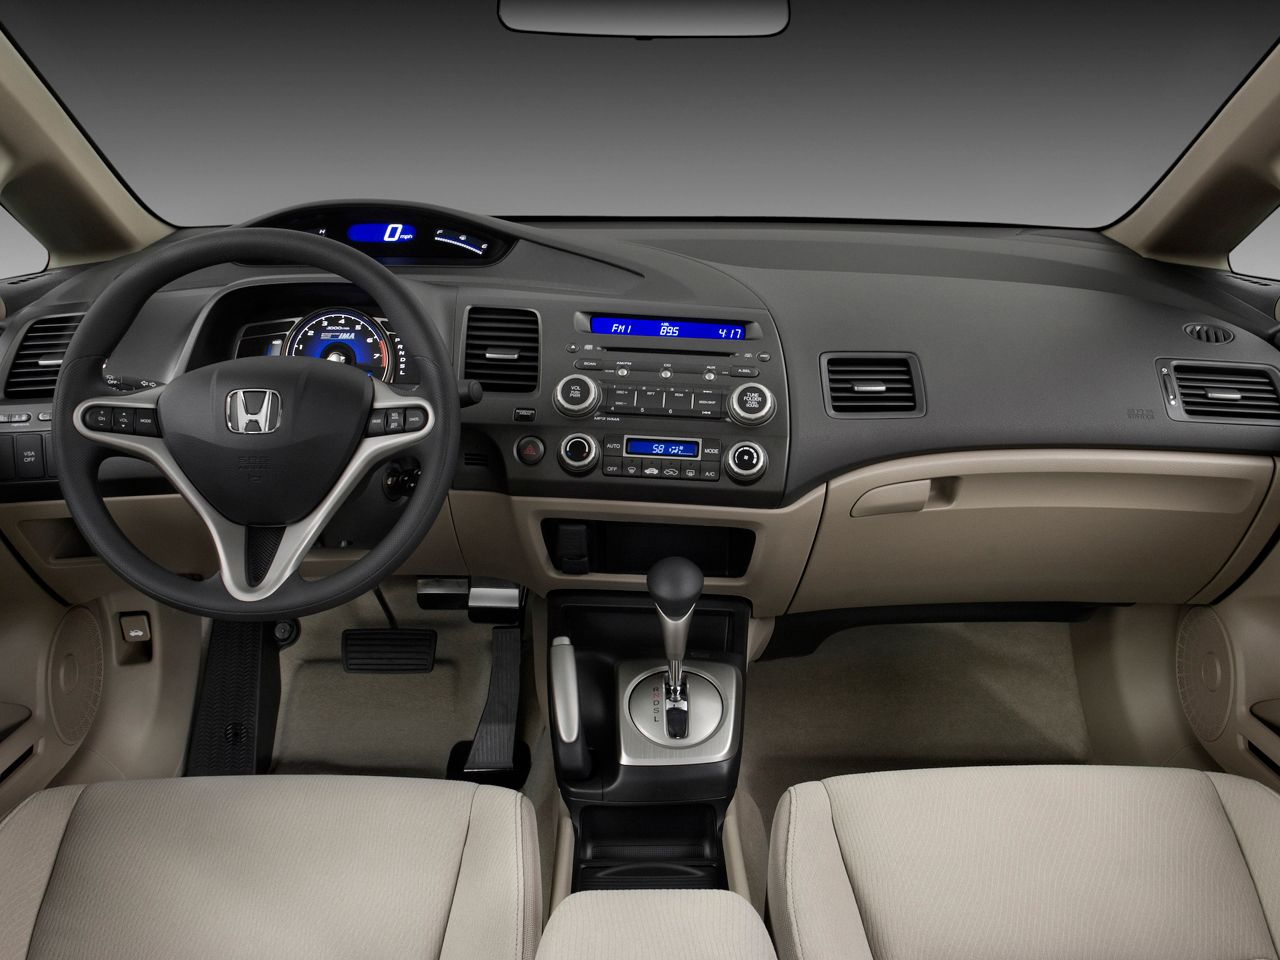 Honda Civic Hybrid Cvt Automatic Pzev